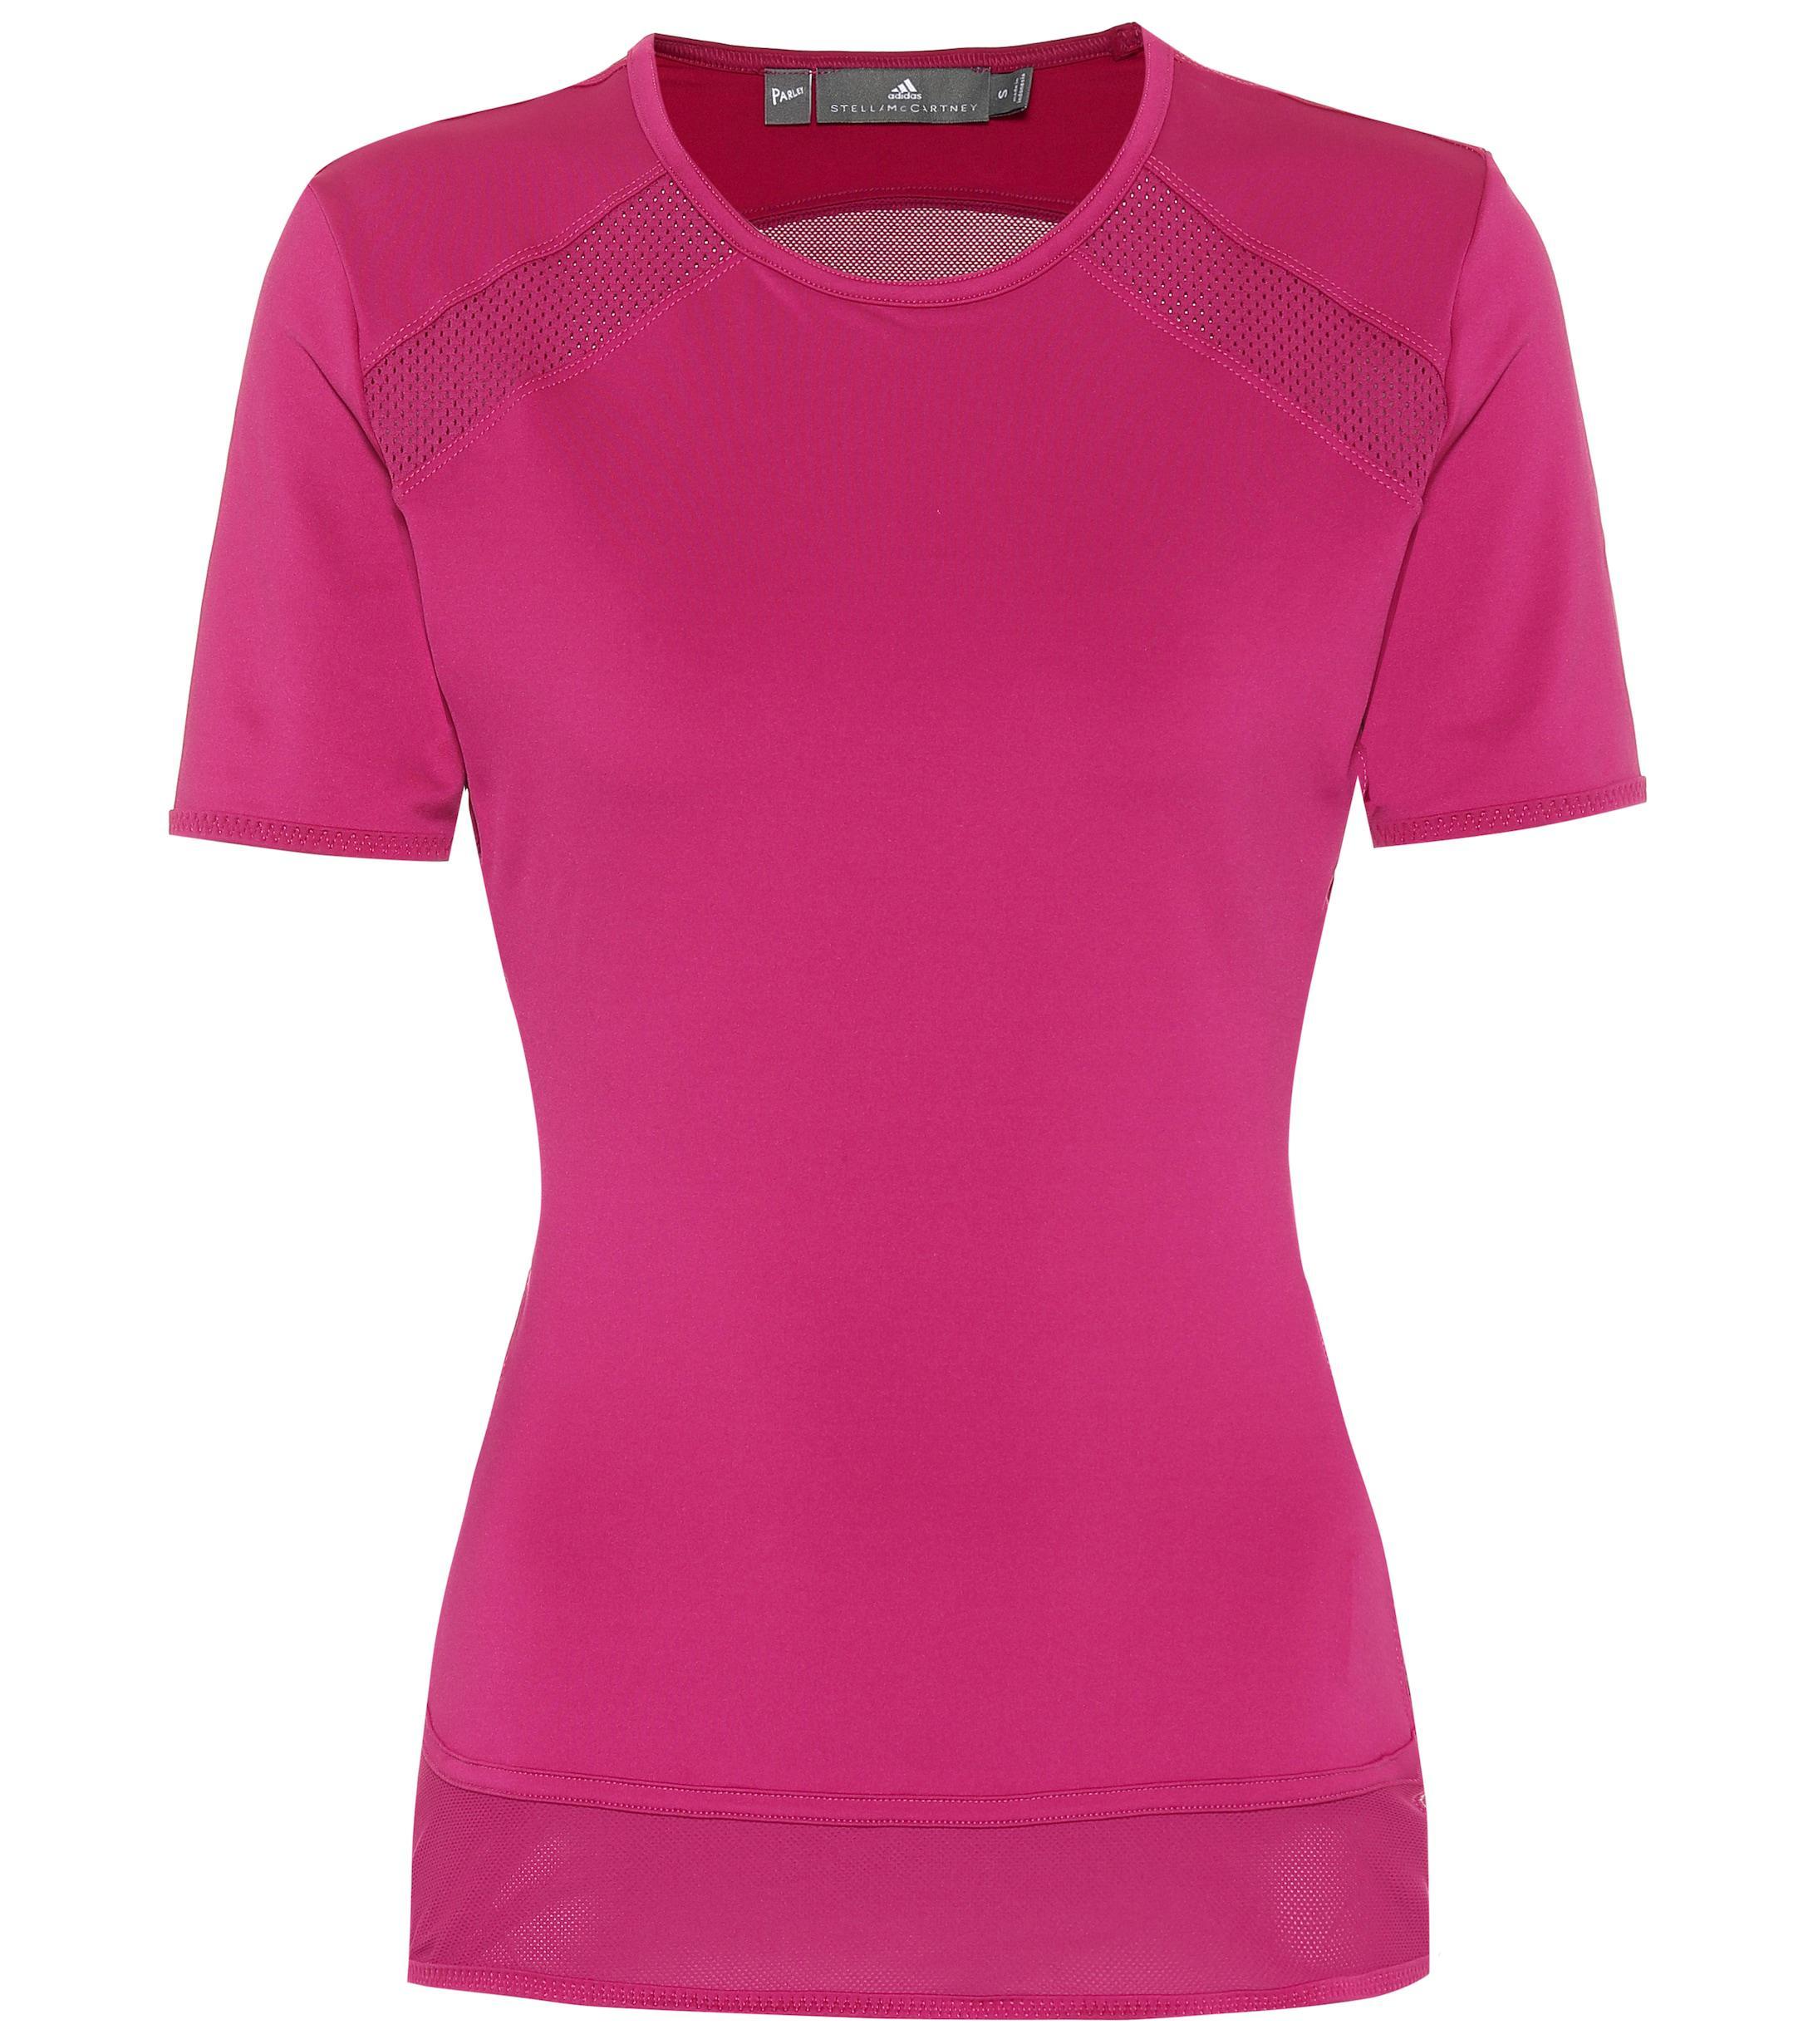 17cf837ee4 Lyst - adidas By Stella McCartney Performance Essentials T-shirt in Pink